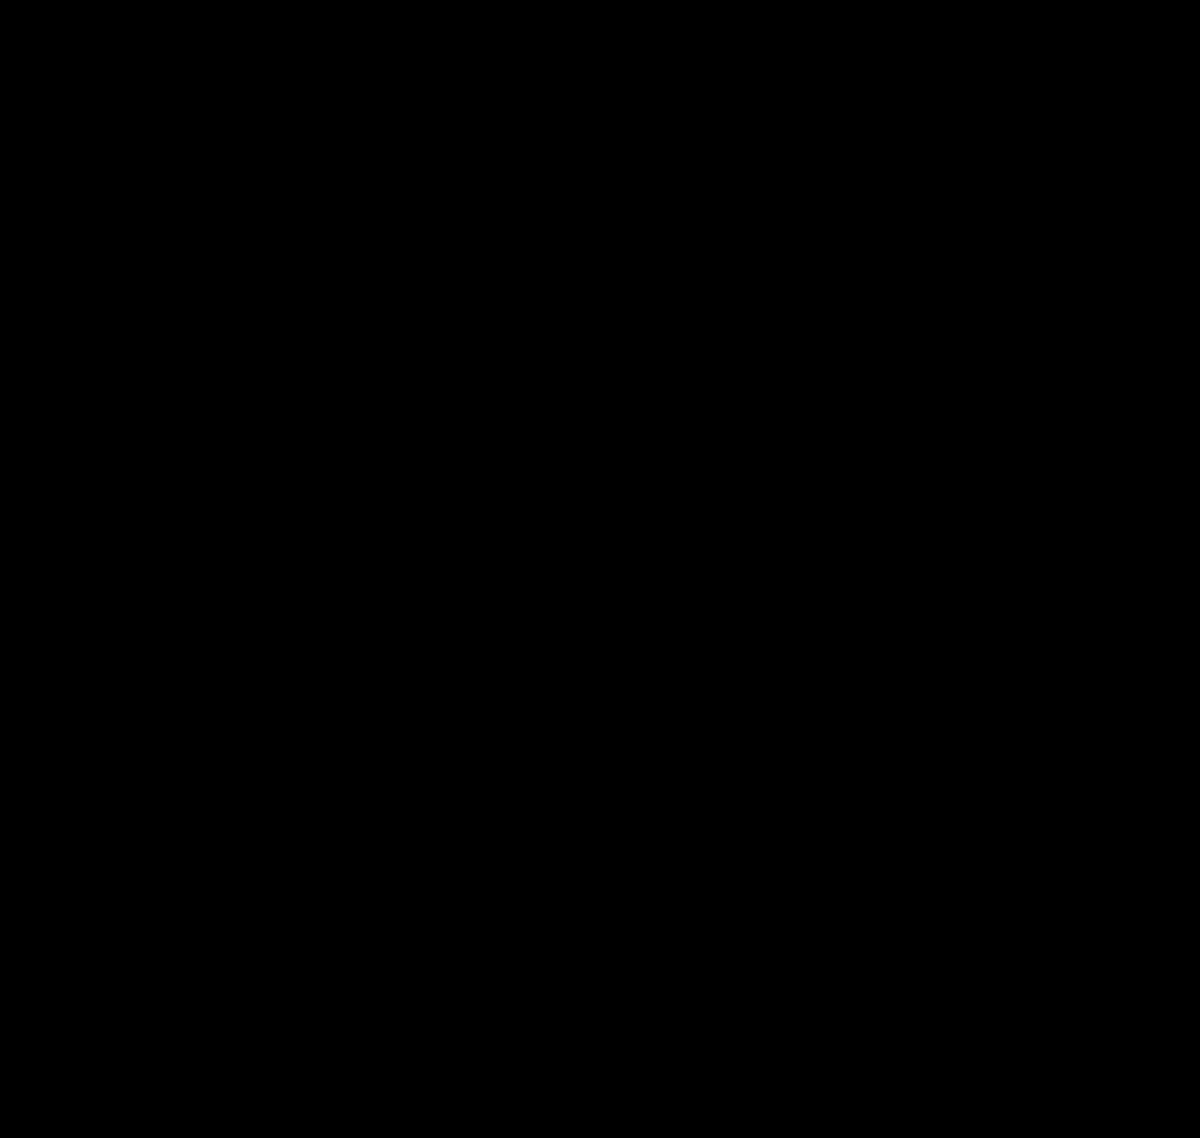 Engine clipart physics motion. Clockwise wikipedia